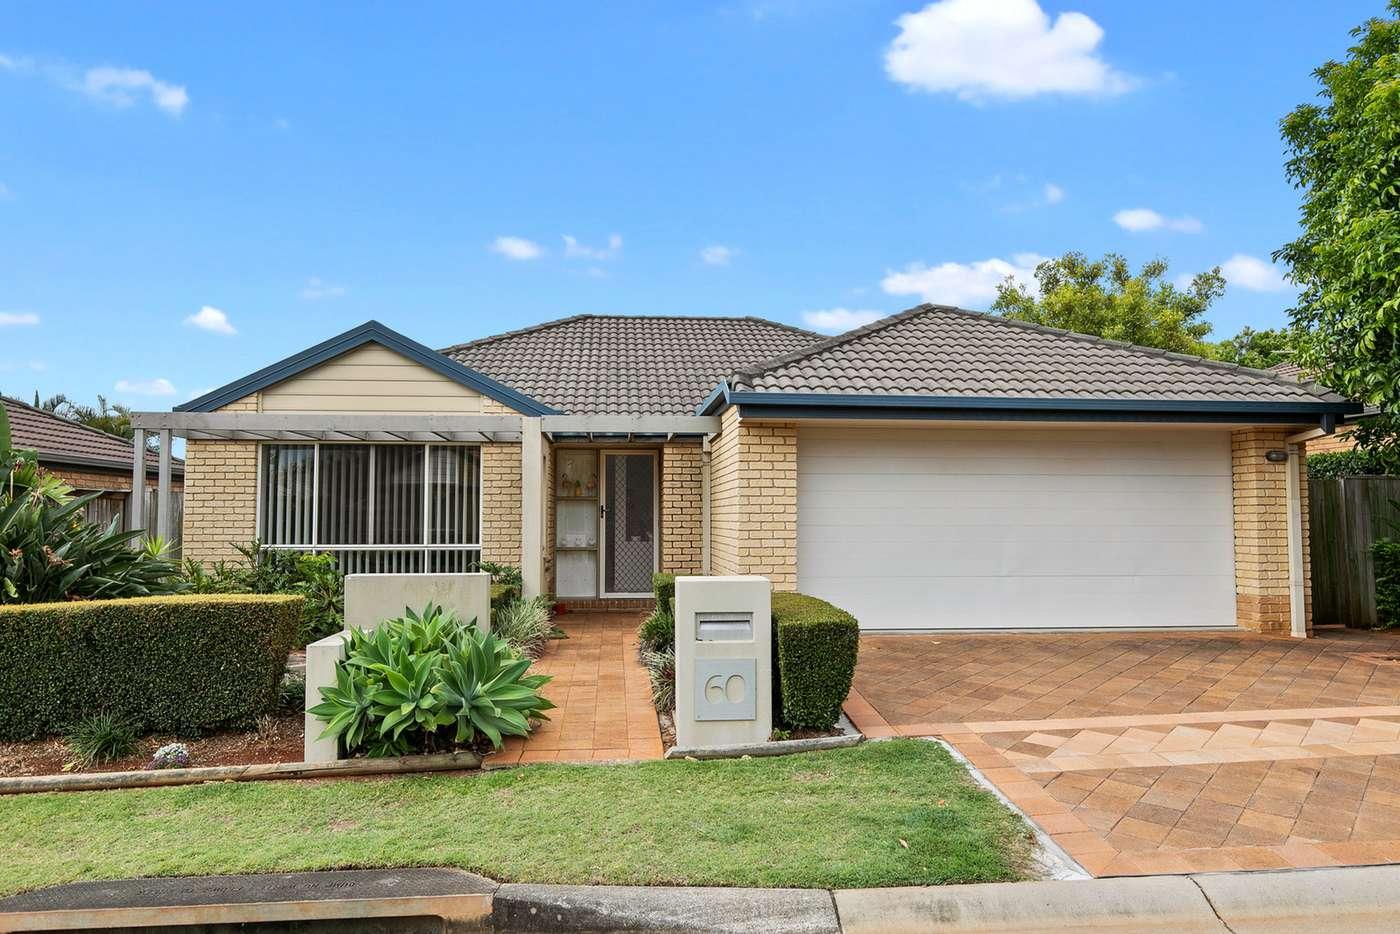 Main view of Homely house listing, Unit 60 130 Gordon Street, Ormiston, QLD 4160